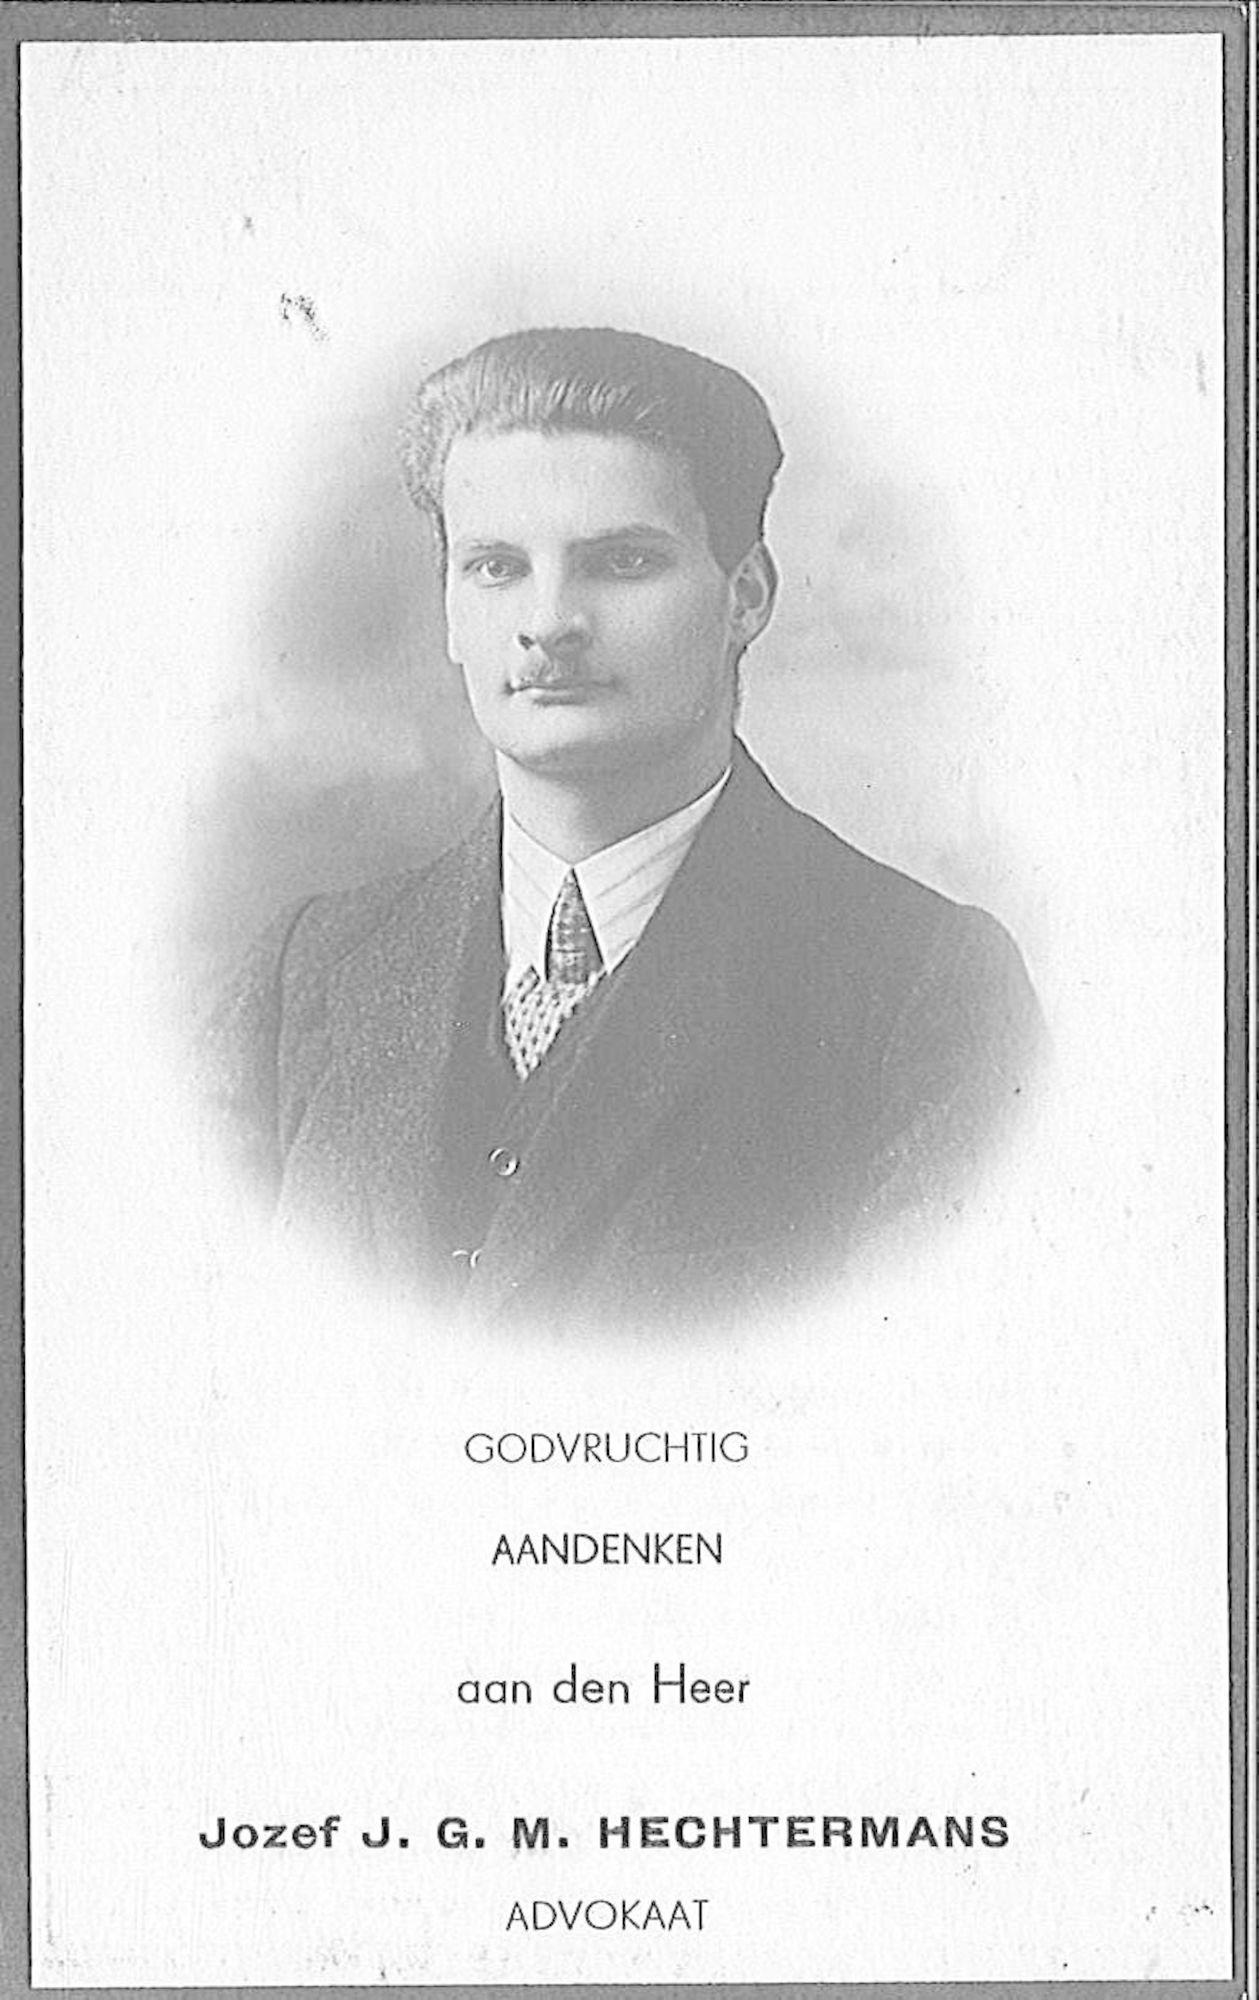 Jozef-J.G.M. Hechtermans